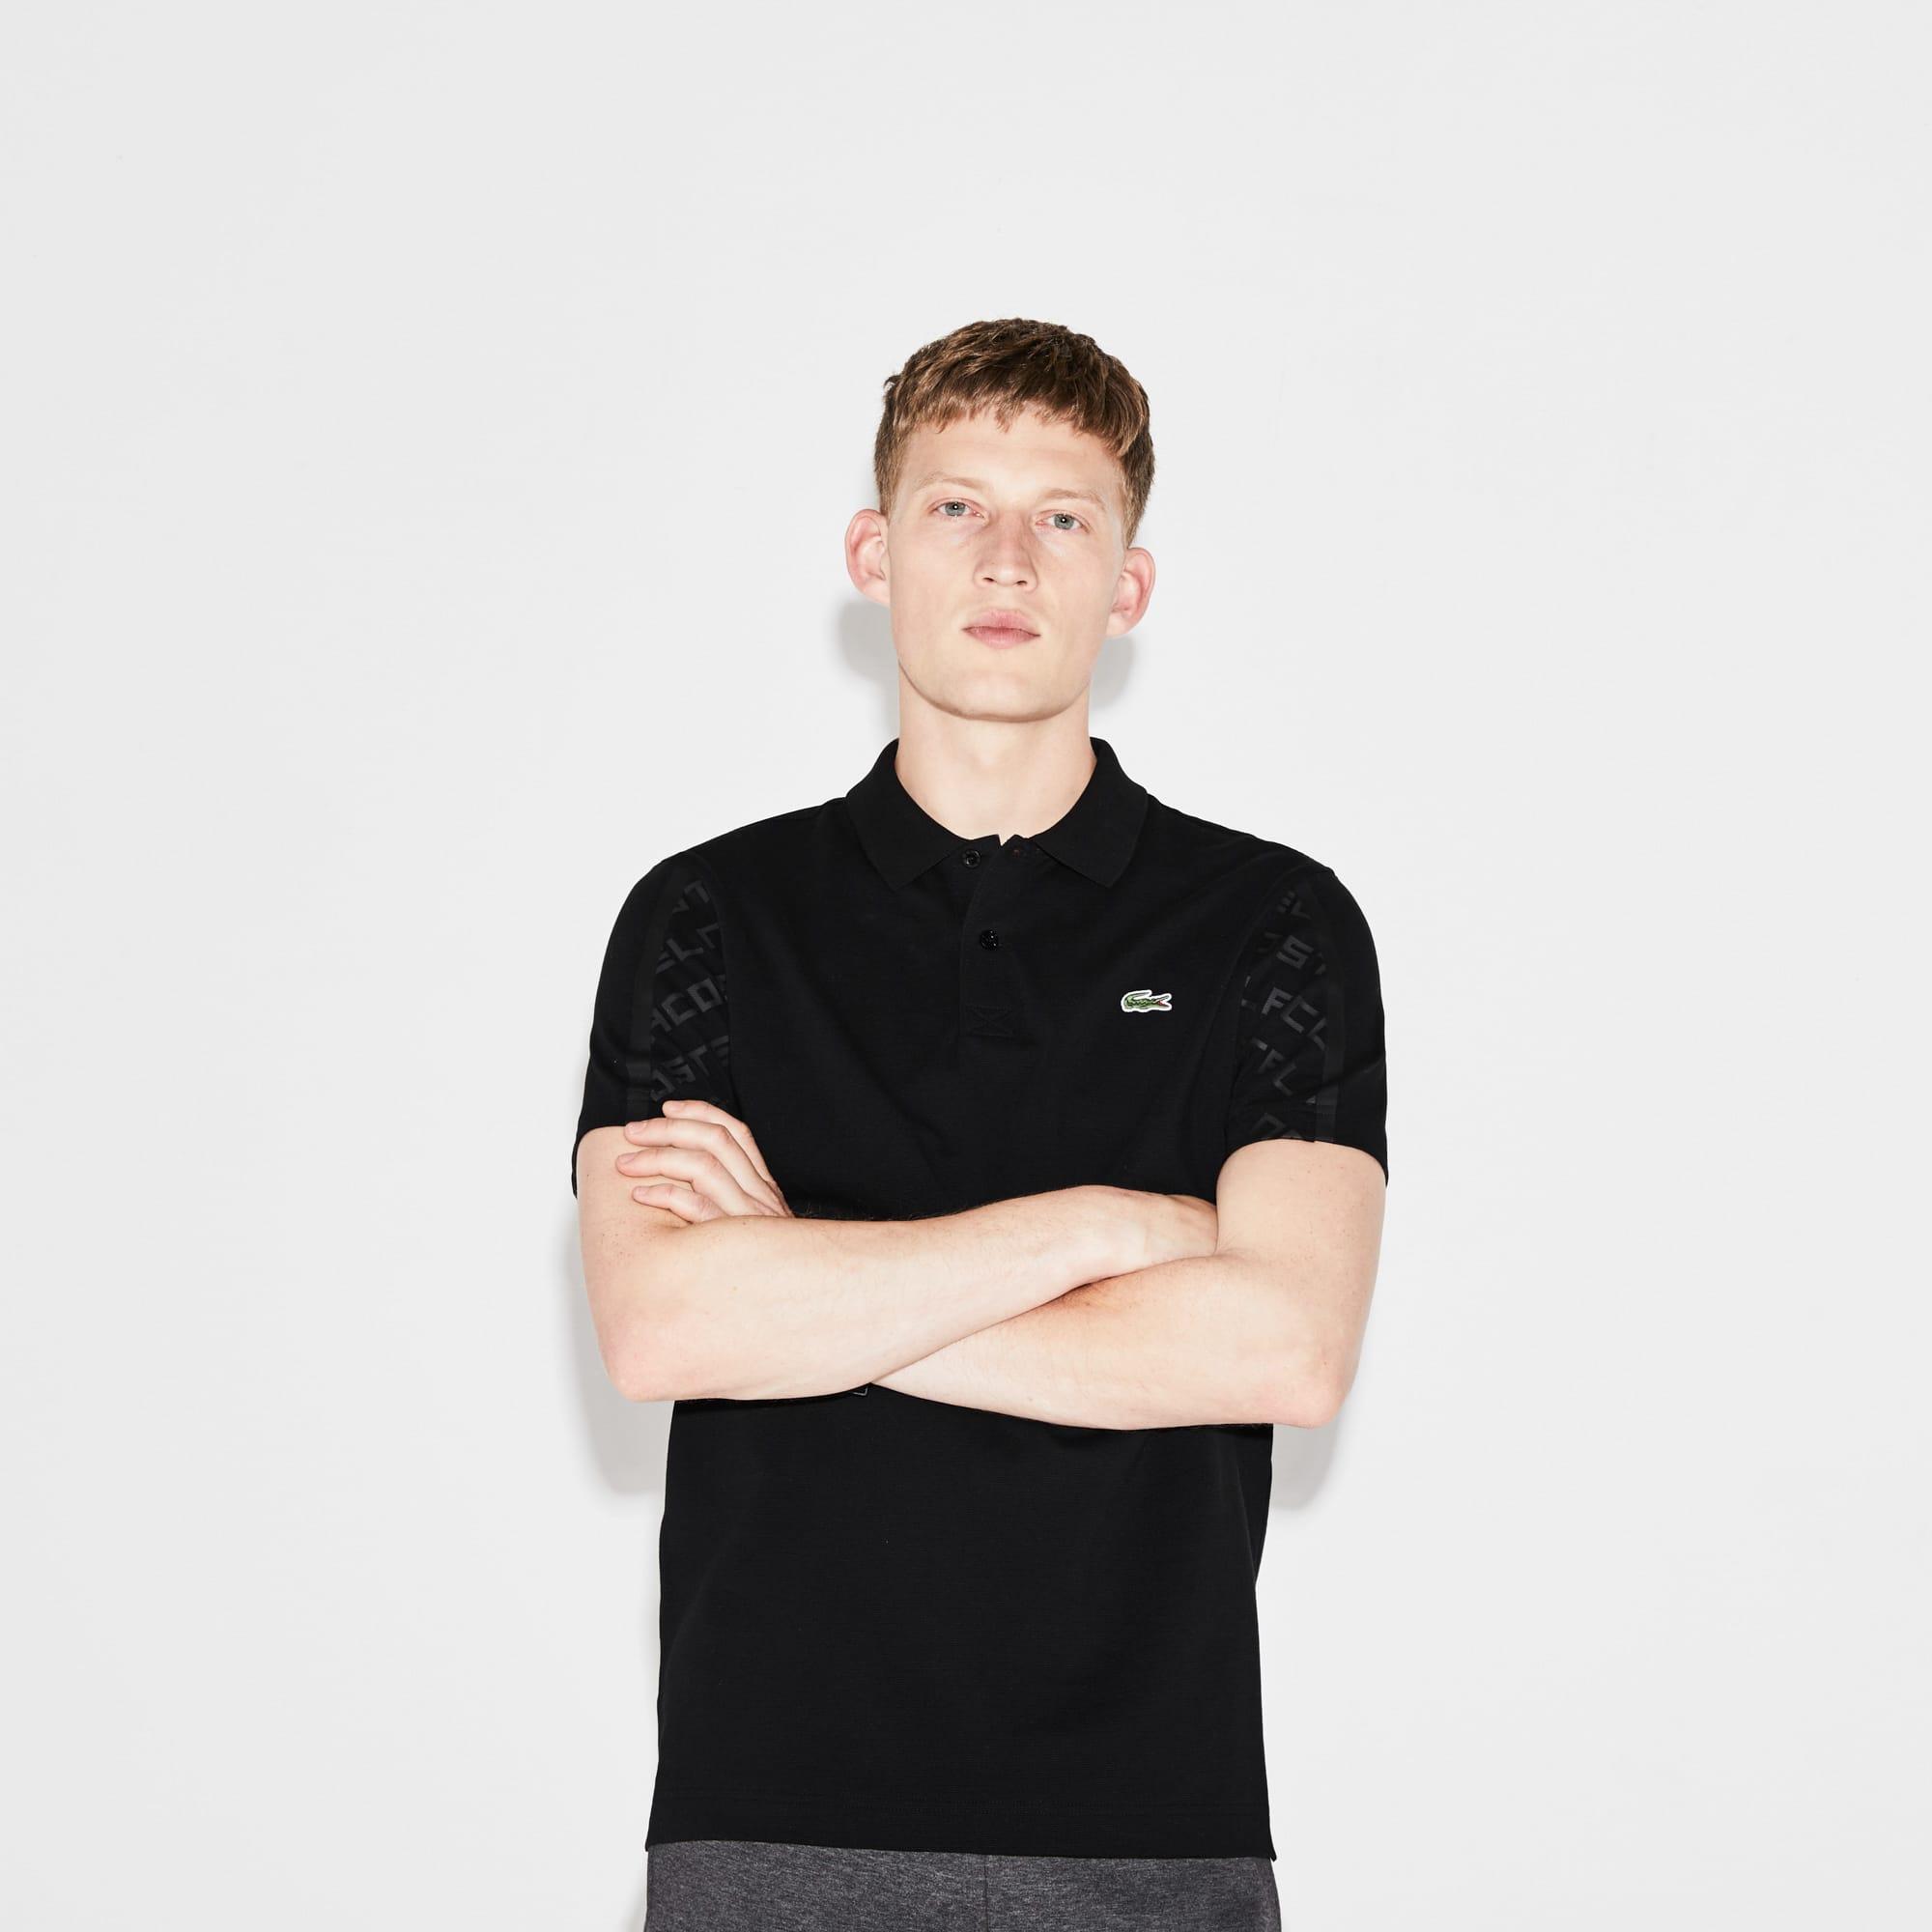 Men's Lacoste SPORT Tennis Print Sleeves Lightweight Knit Polo